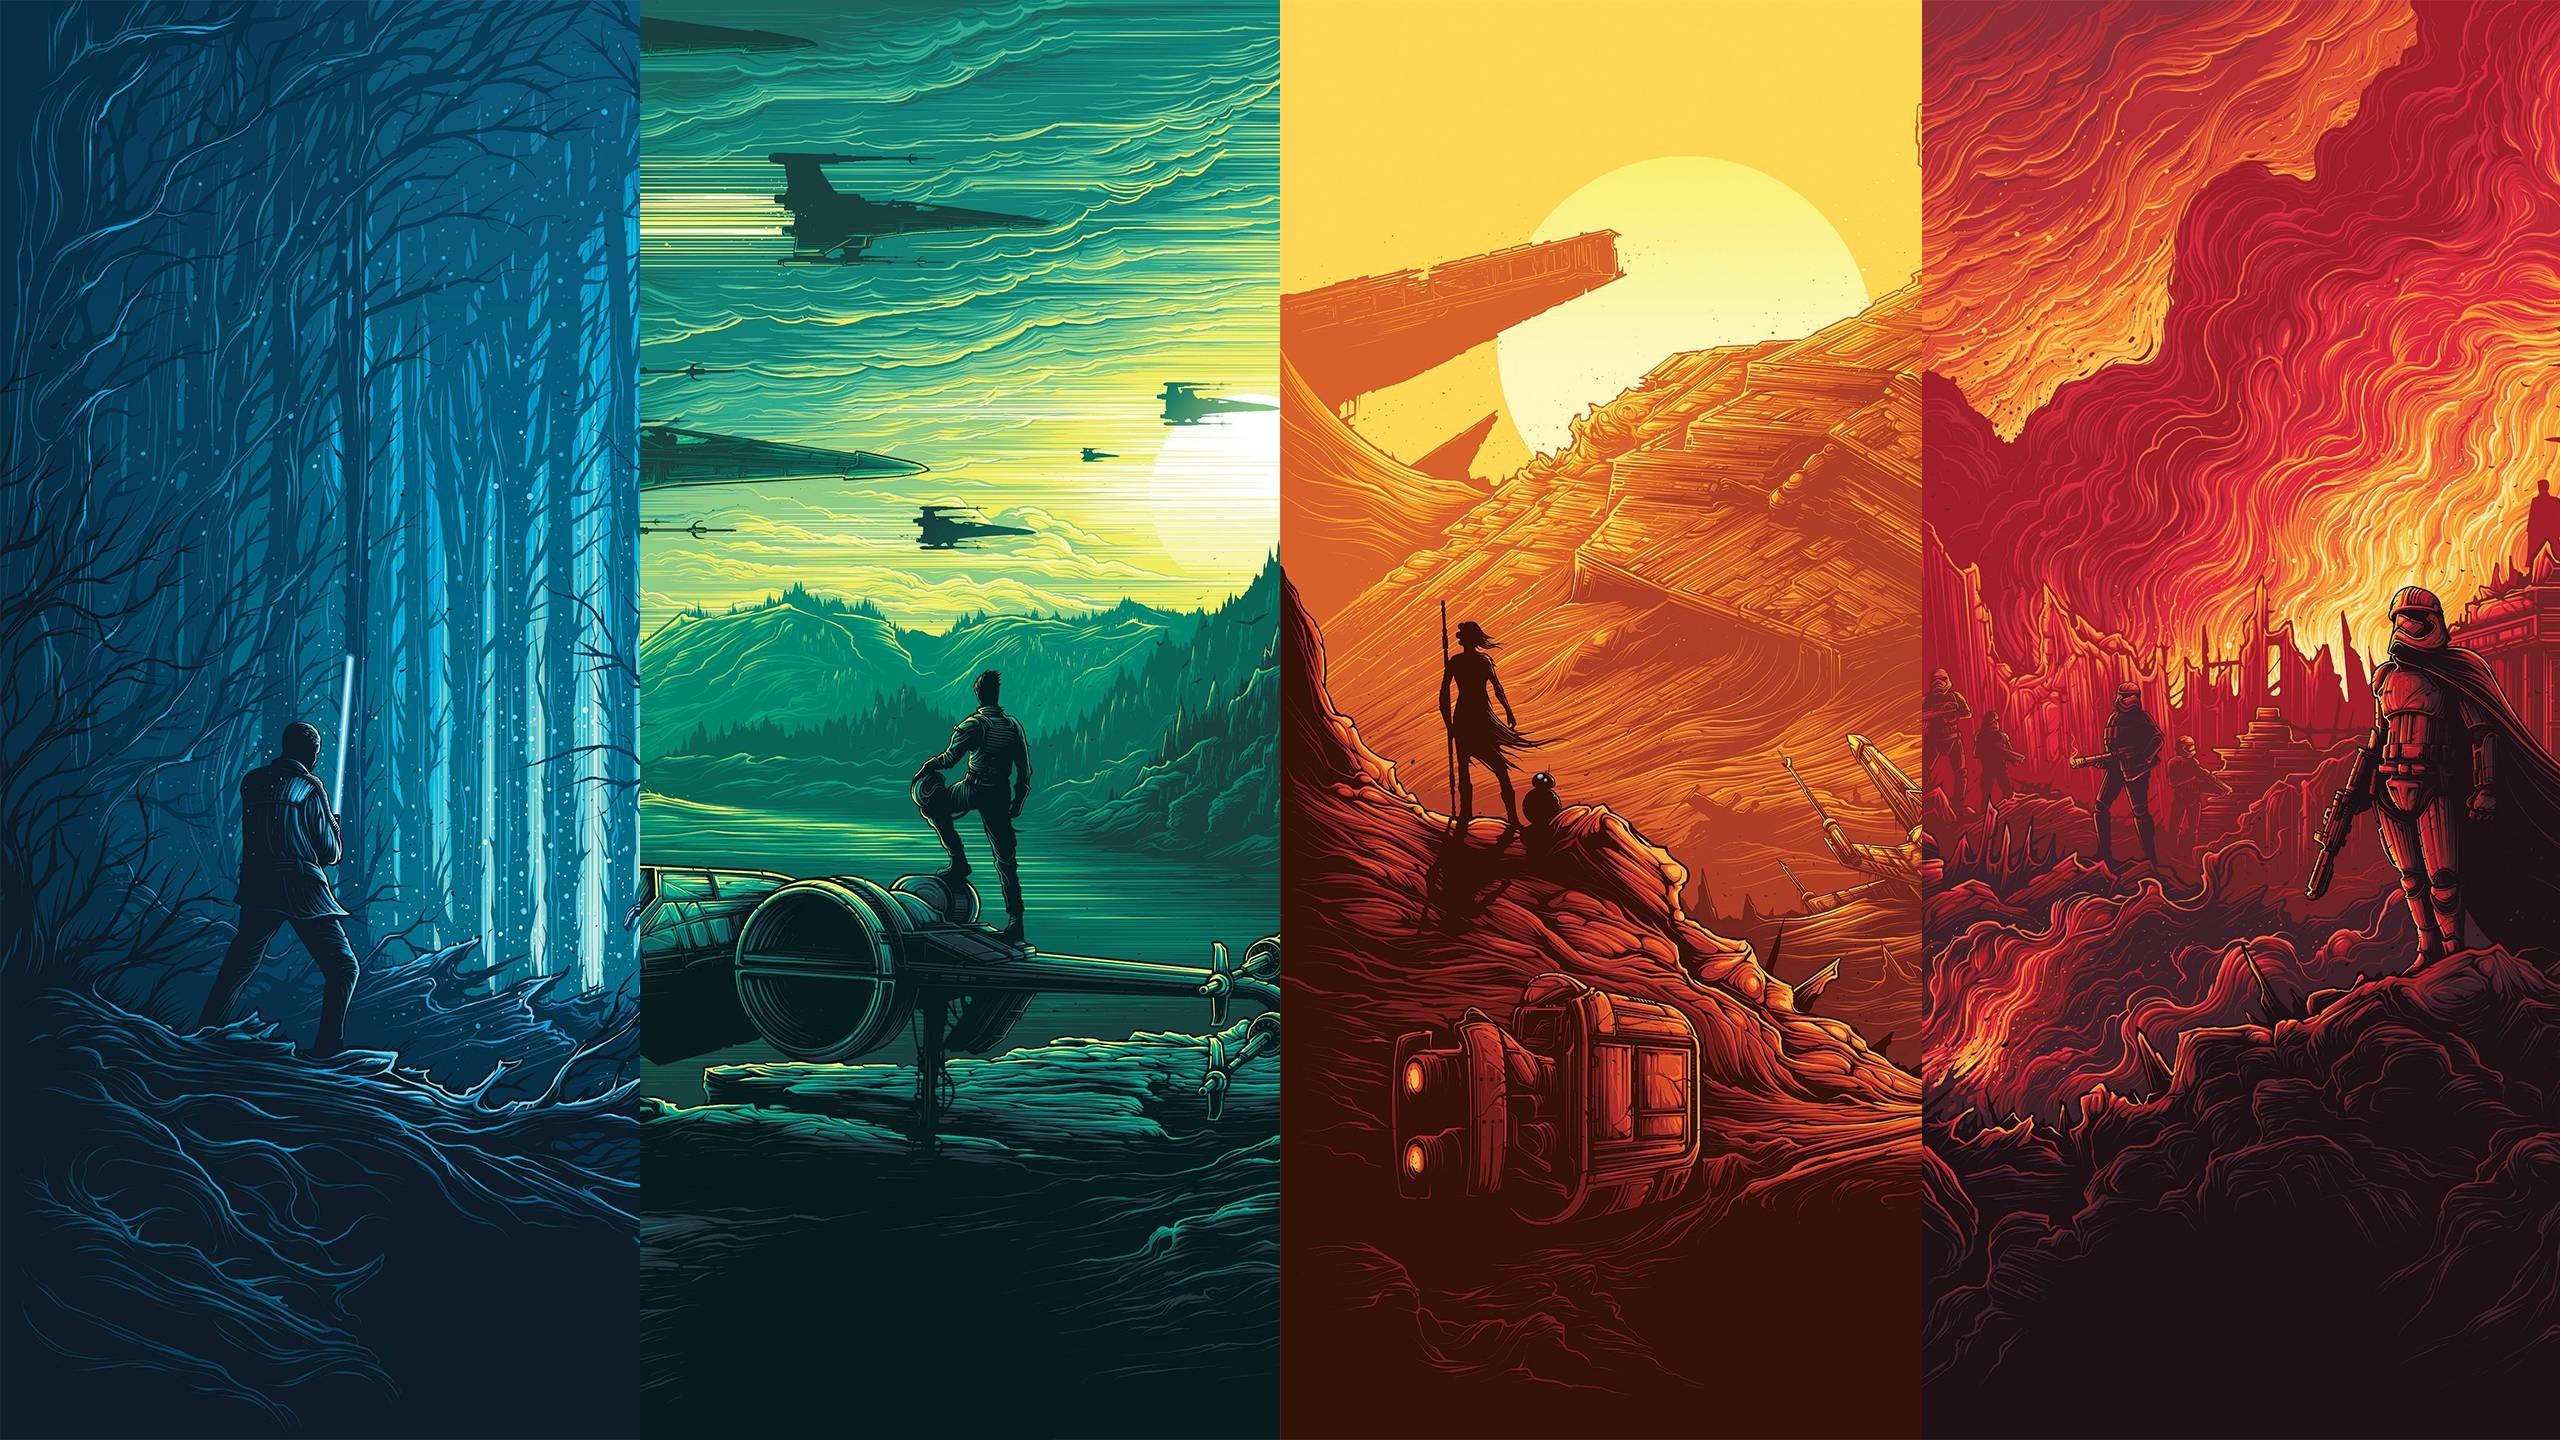 Wallpaper Illustration Collage Star Wars The Force Awakens Art Screenshot Computer Wallpaper 2560x1440 Cybersickness 80141 Hd Wallpapers Wallhere